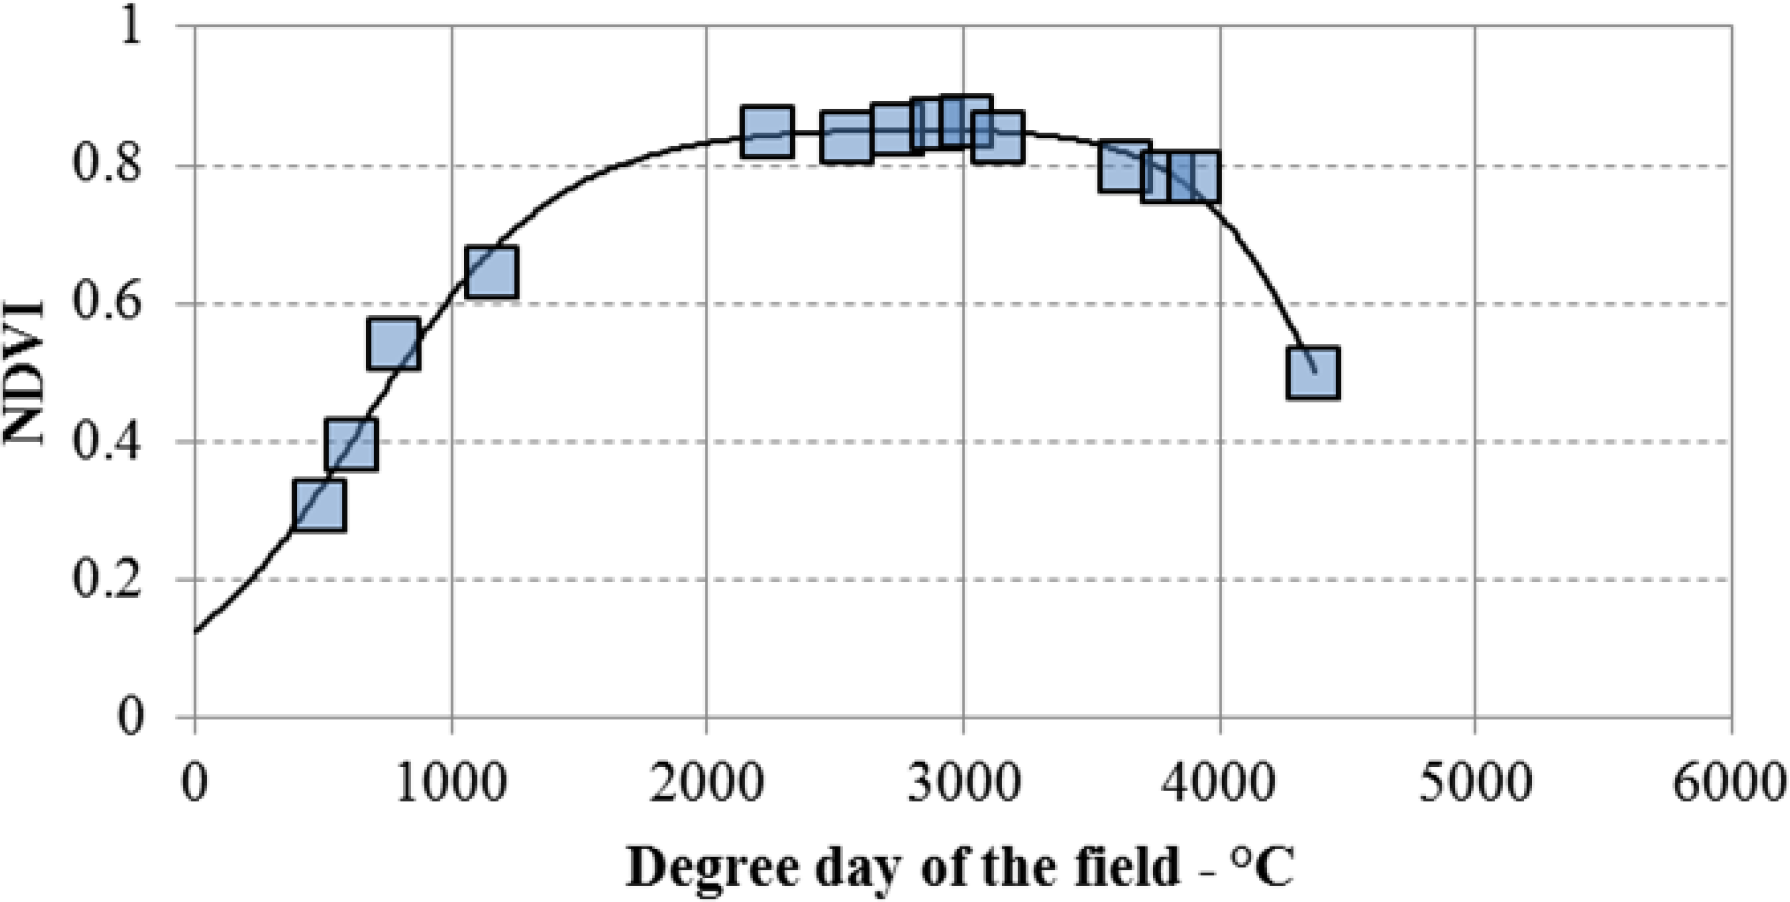 forecasting models for yield estimation